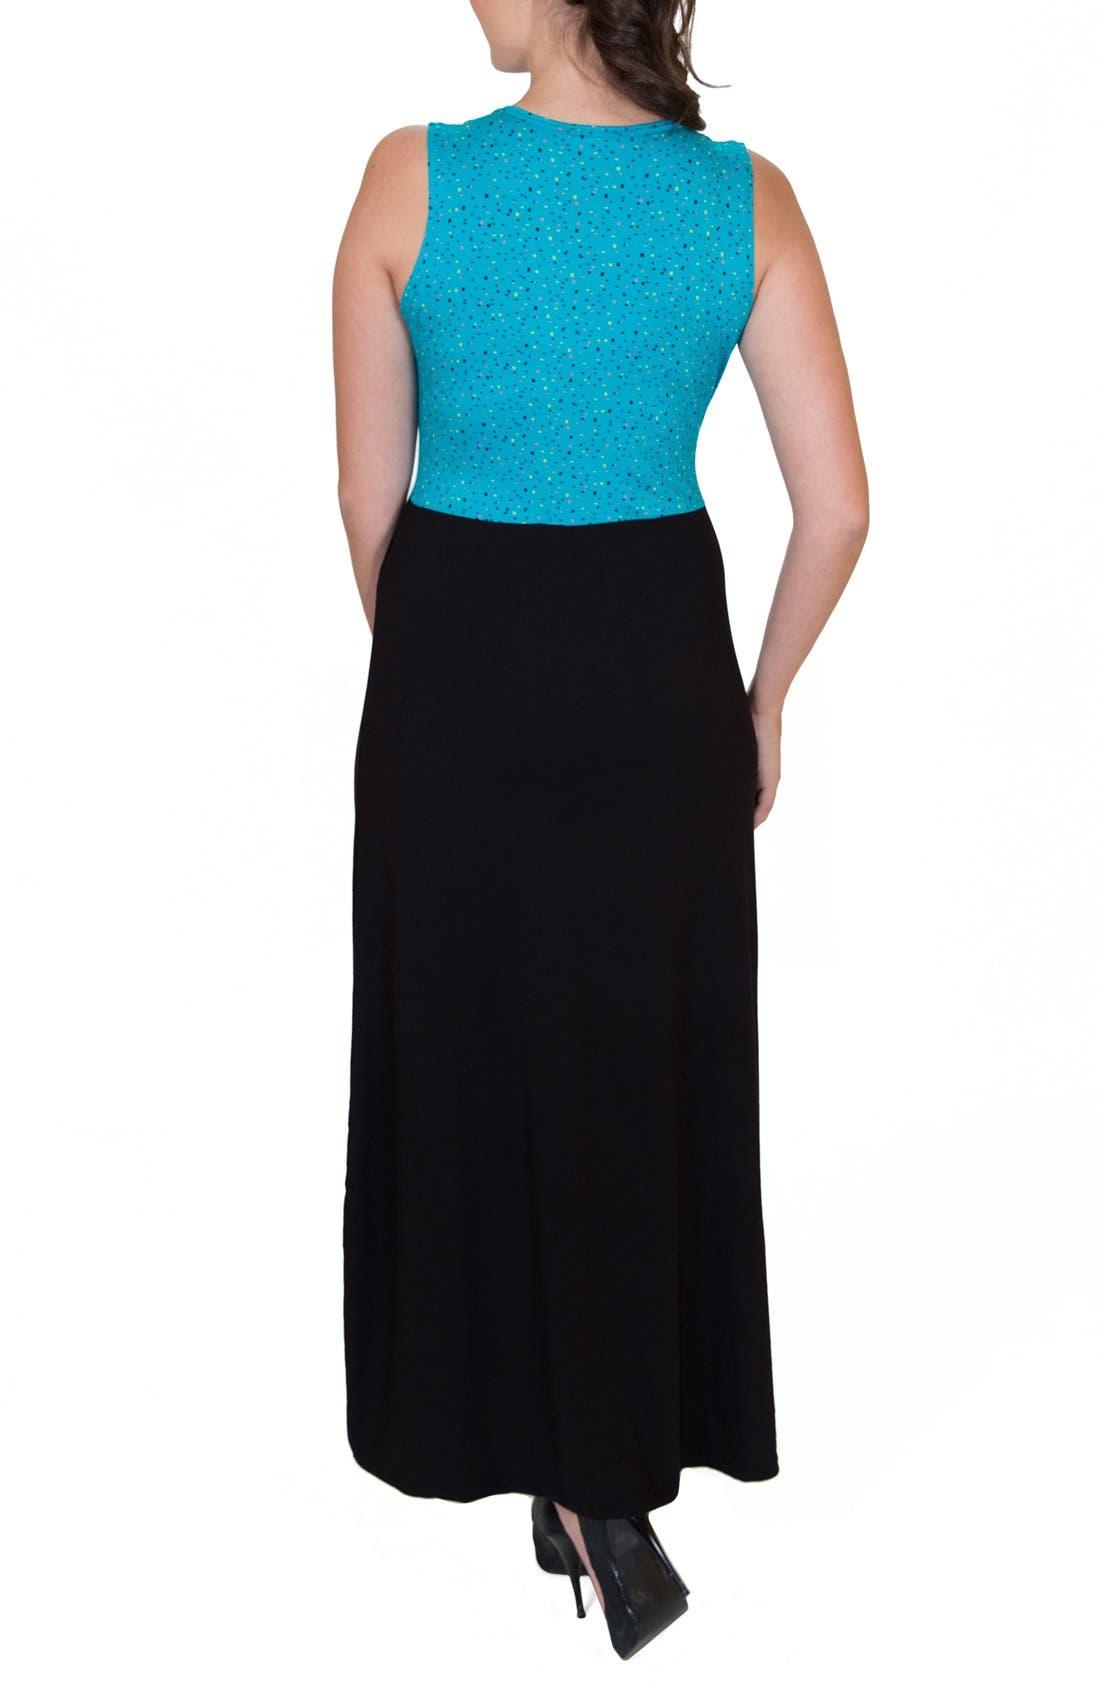 'Mariana' Maternity/Nursing Maxi Dress,                             Alternate thumbnail 2, color,                             DOTS TOP W/ BLACK SKIRT